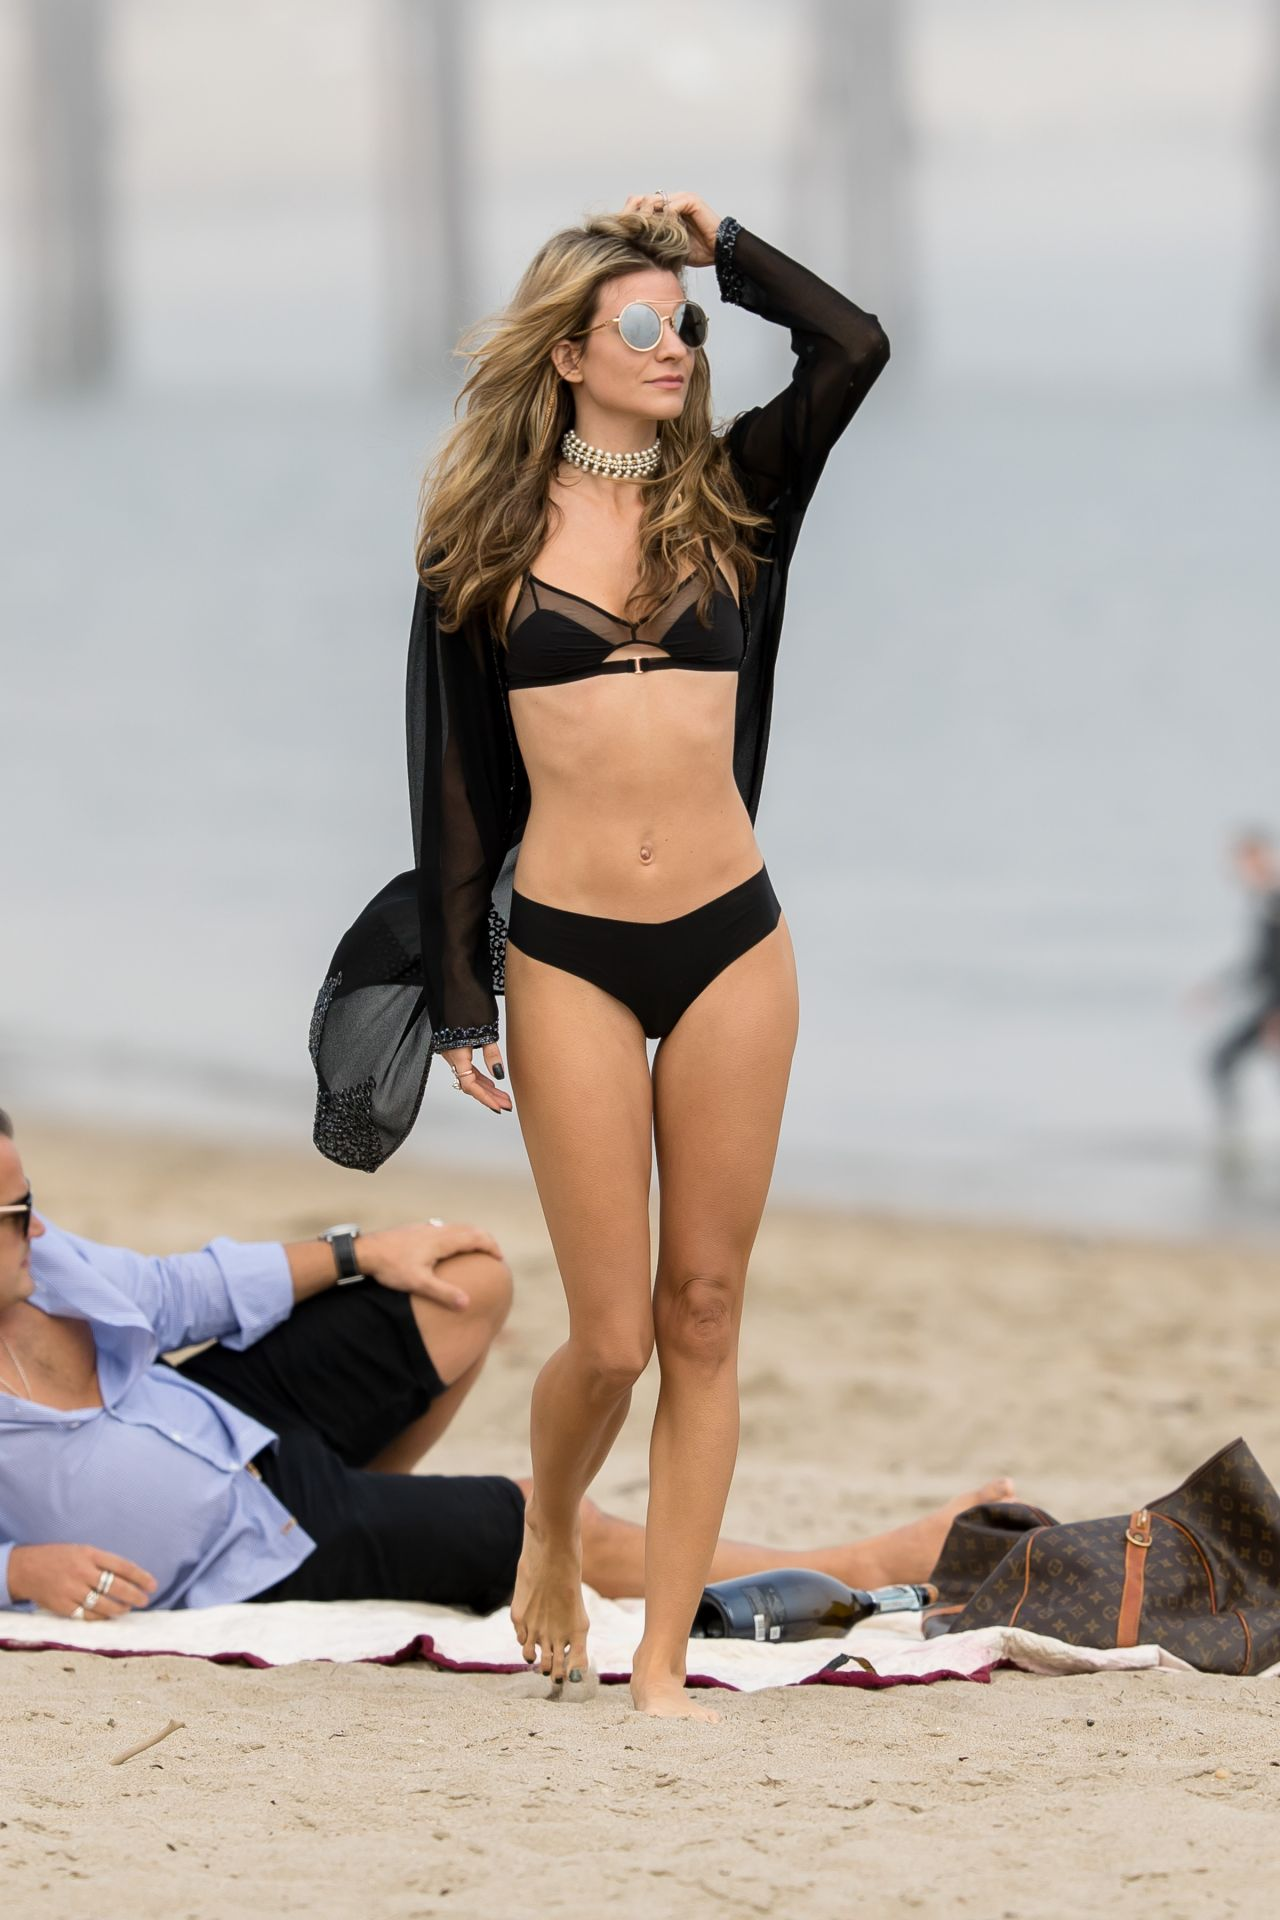 Rachel McCord in Black Bikini at a beach in Malibu Pic 2 of 35